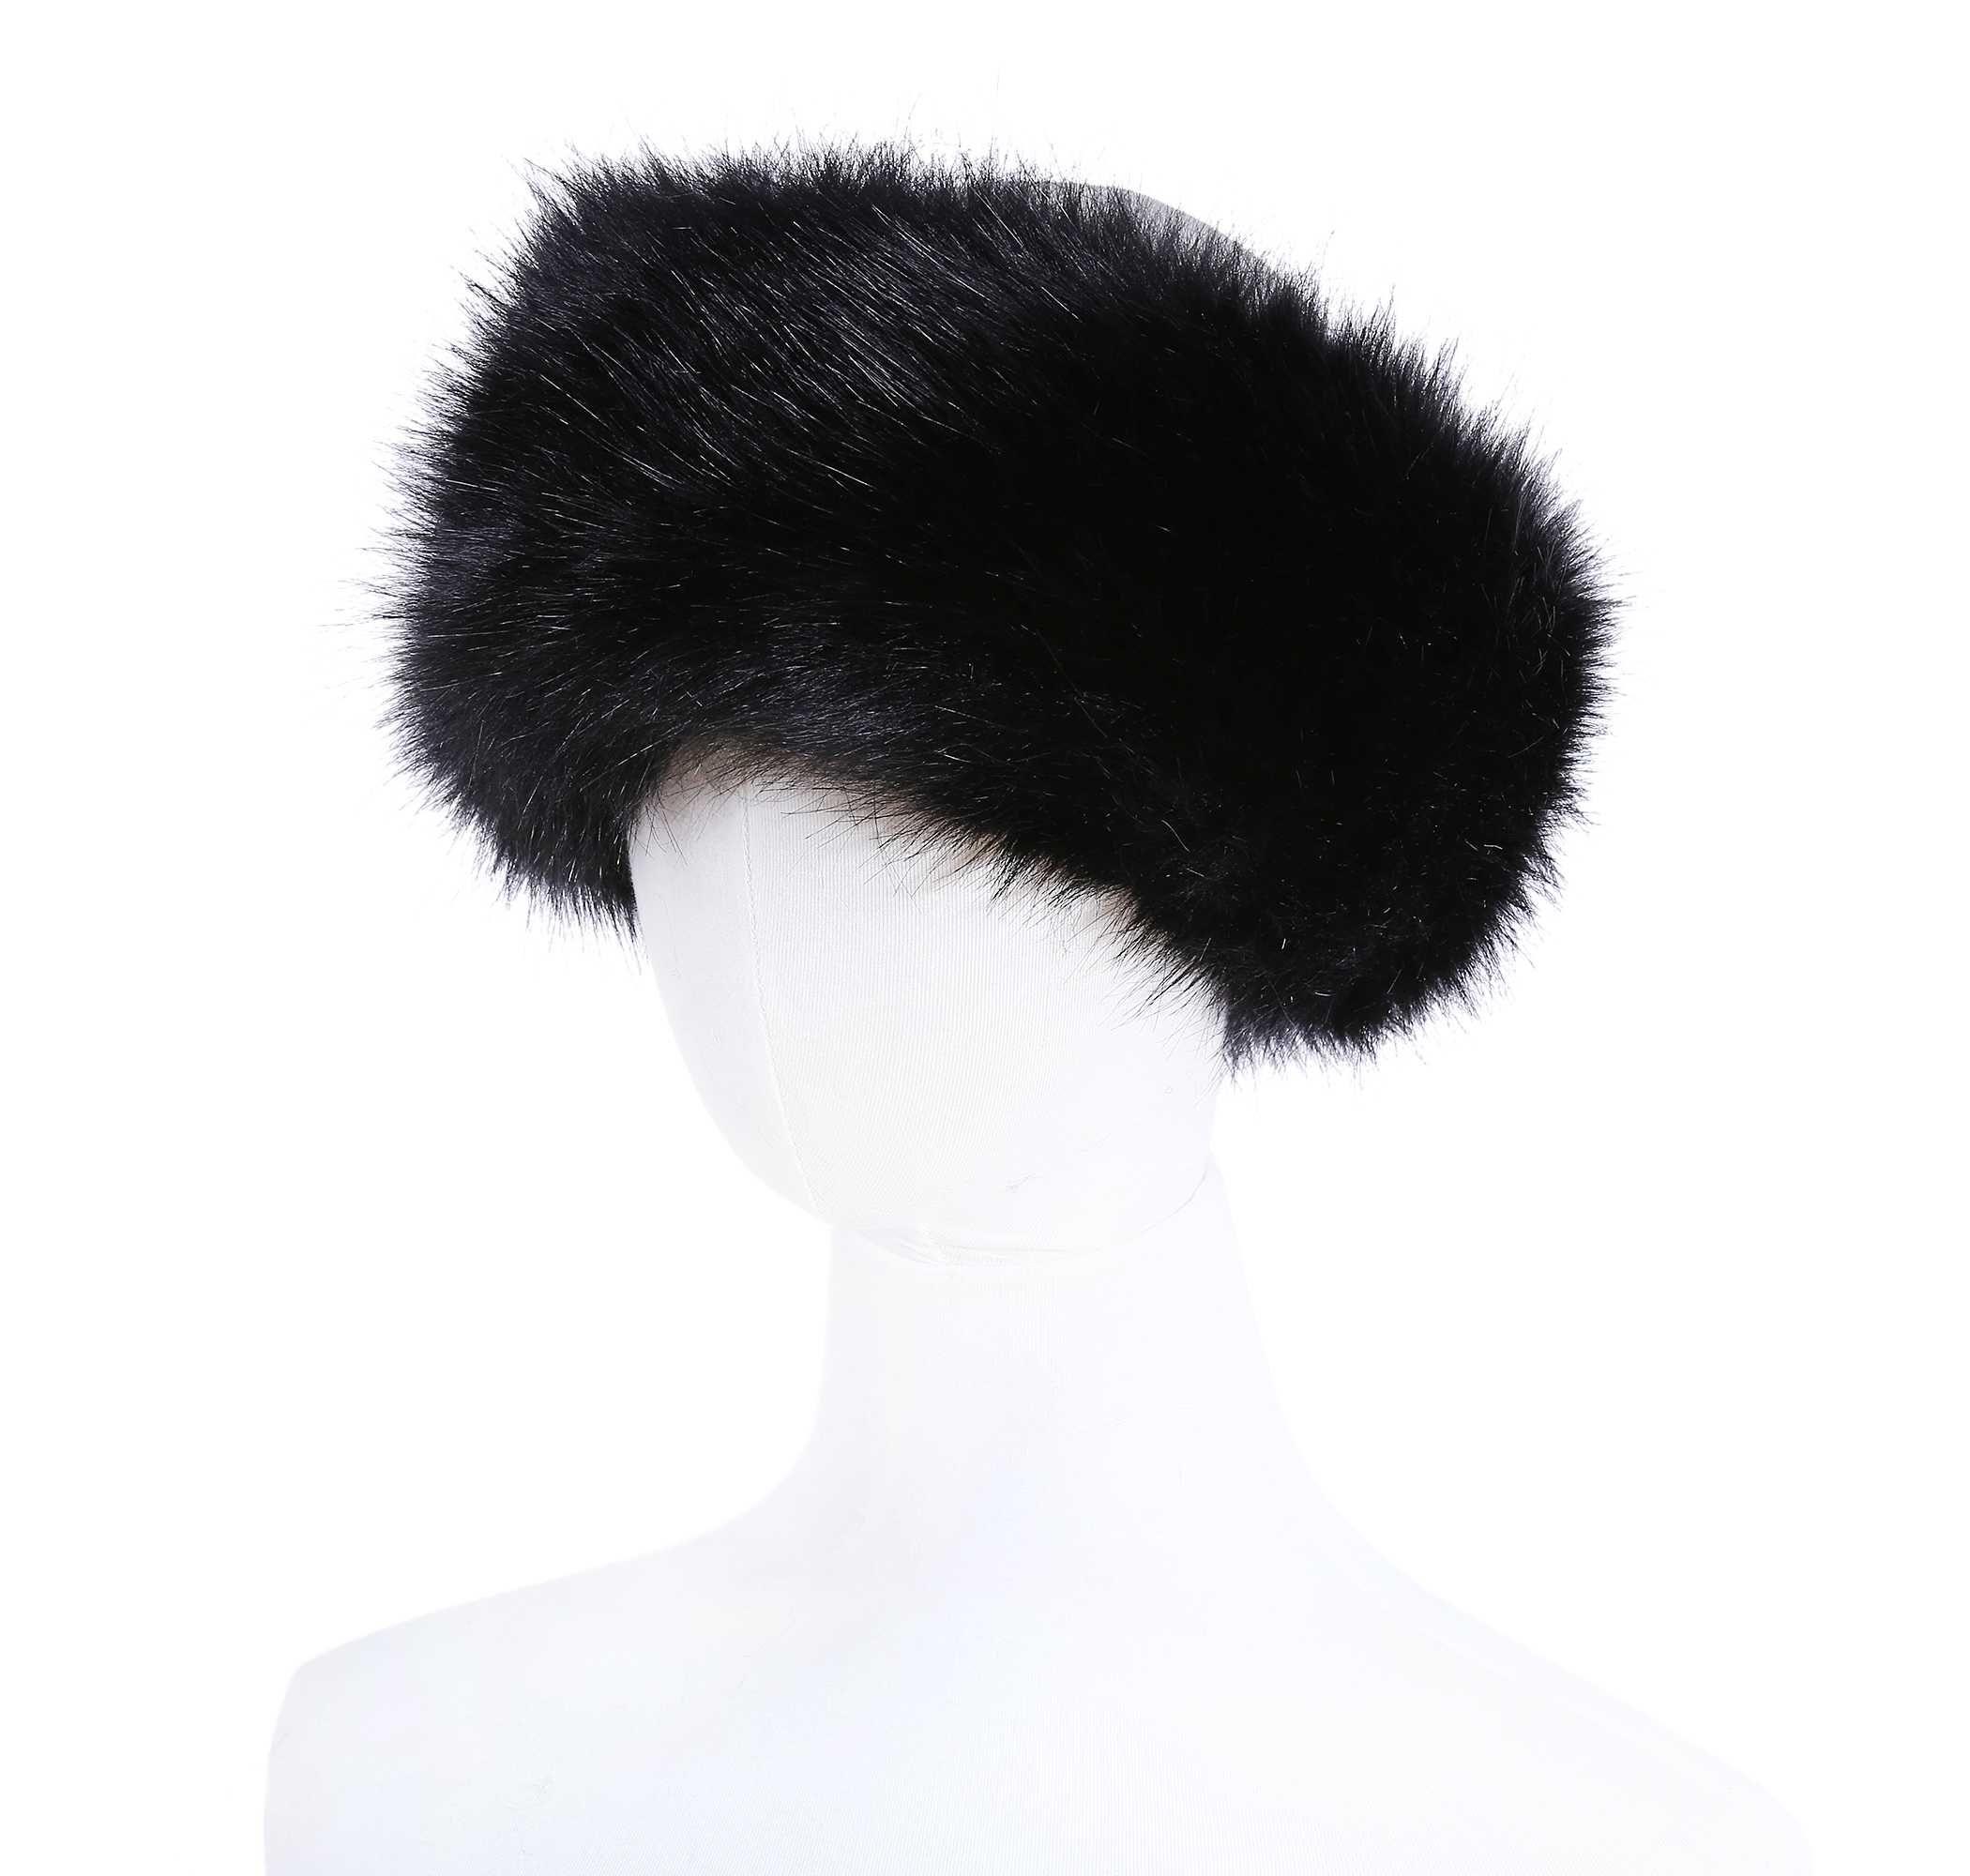 Womens Faux Fur Headband Luxury Adjustable Winter Warm Black White Nature  Girls Earwarmer Earmuff UK 2019 From David2015xu ab0f87823e7